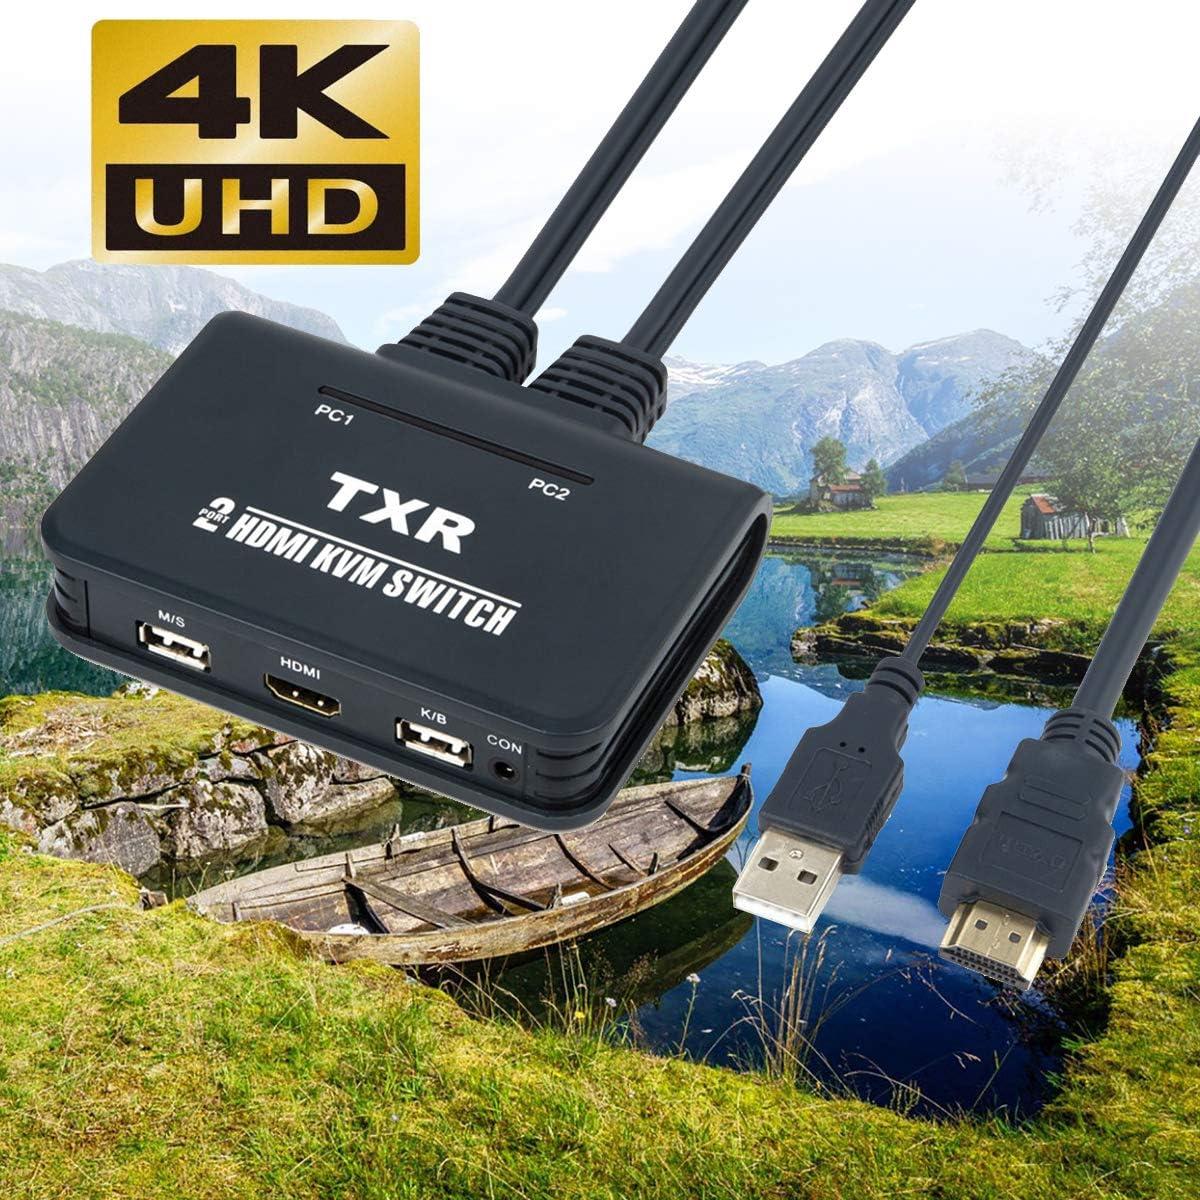 XZANTE 2 Port HDMI KVM Switch with Cables EL-21UHC